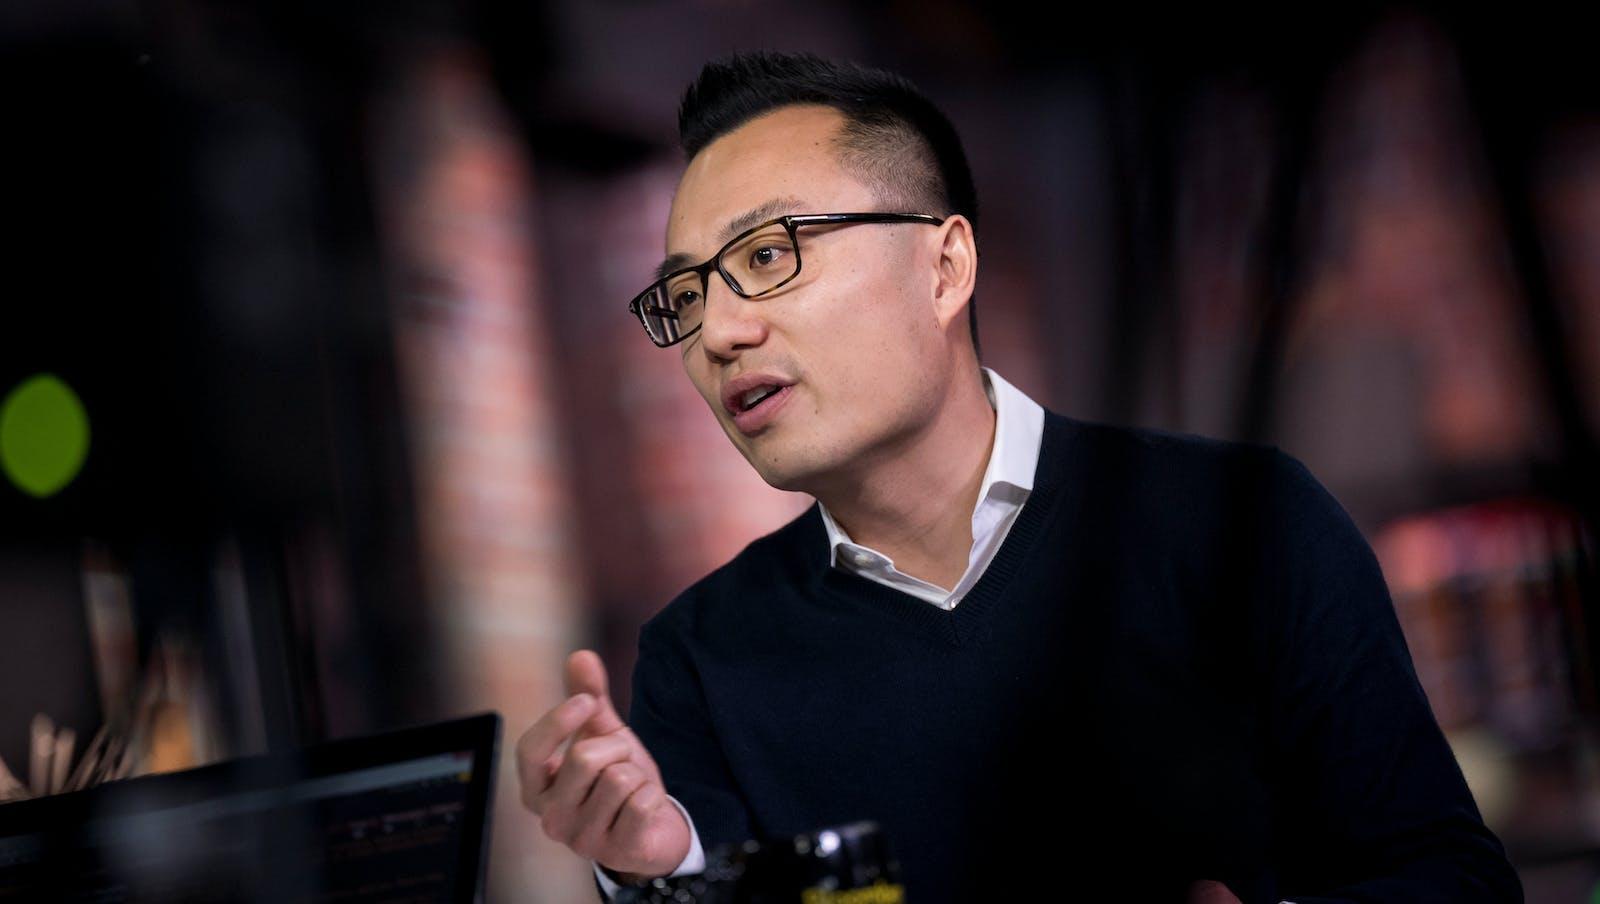 DoorDash CEO Tony Xu. Photo by Bloomberg.